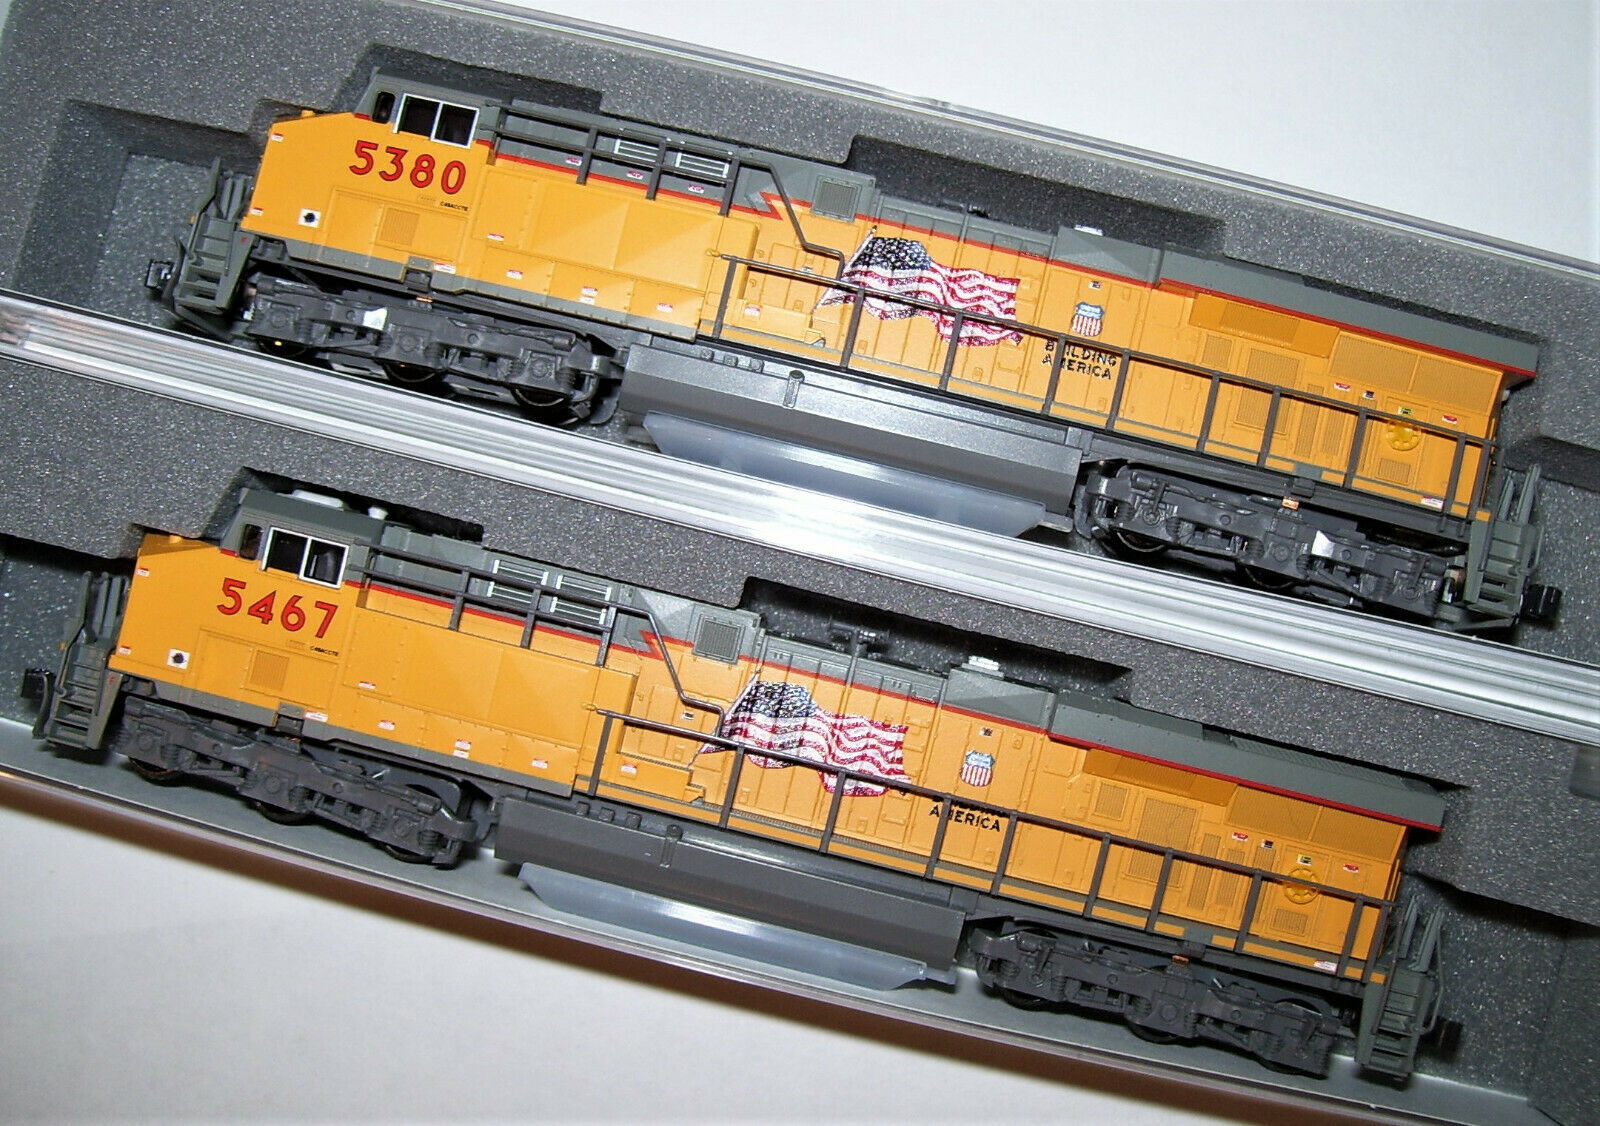 Kato 1768932  1768933 N 2 loco Set ES44AC Union Pacific 54675380 1768932